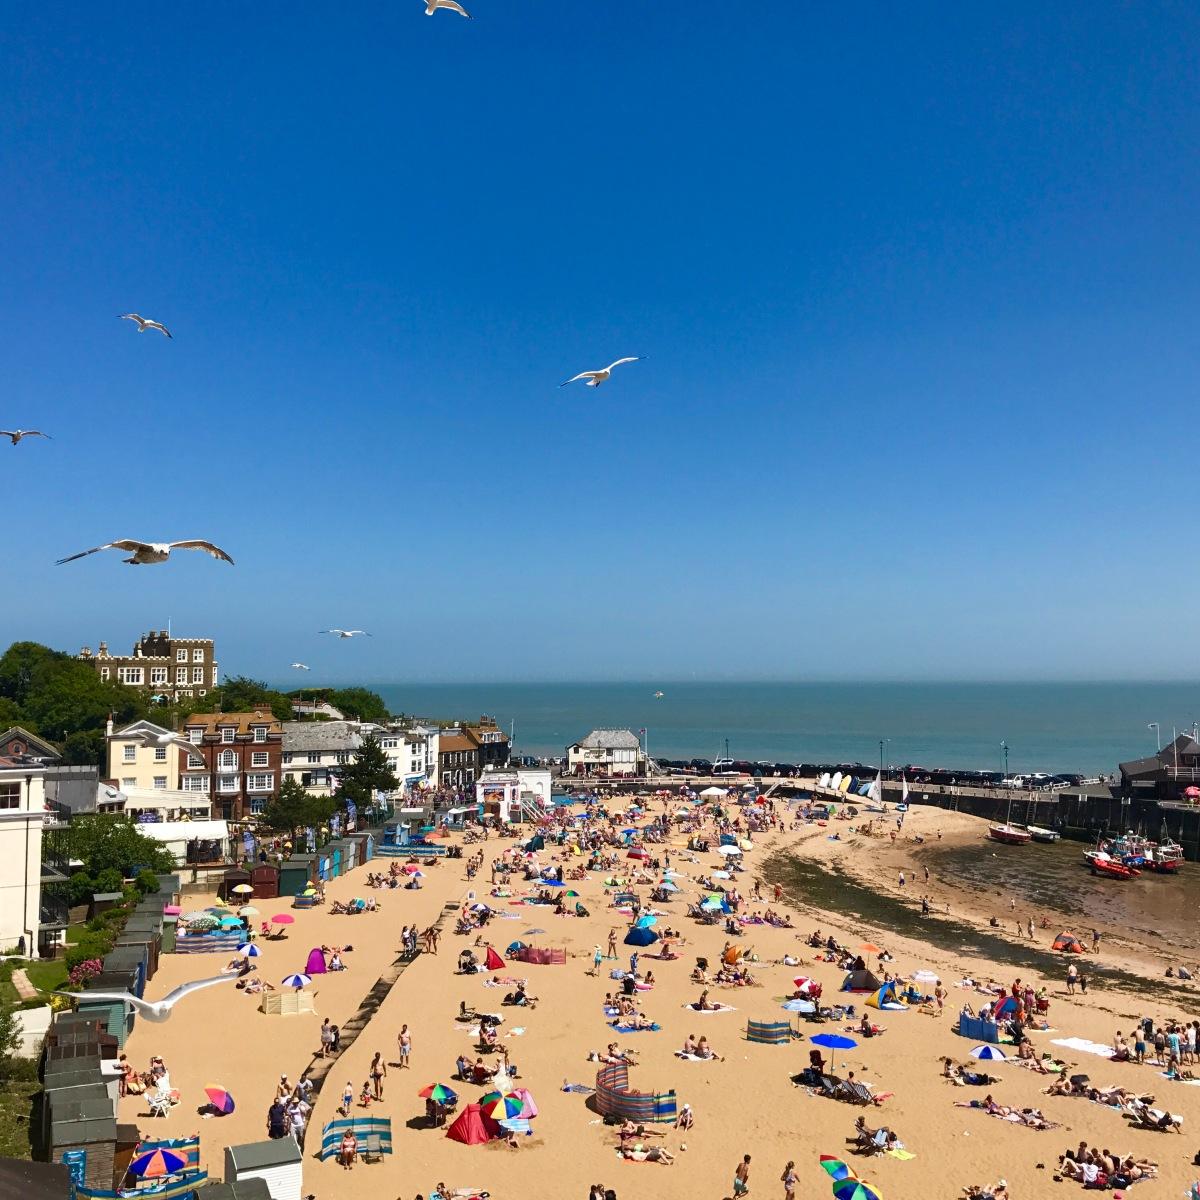 İngiltere'de denize girmek: Isle of Thanet ve Kent sahilleri